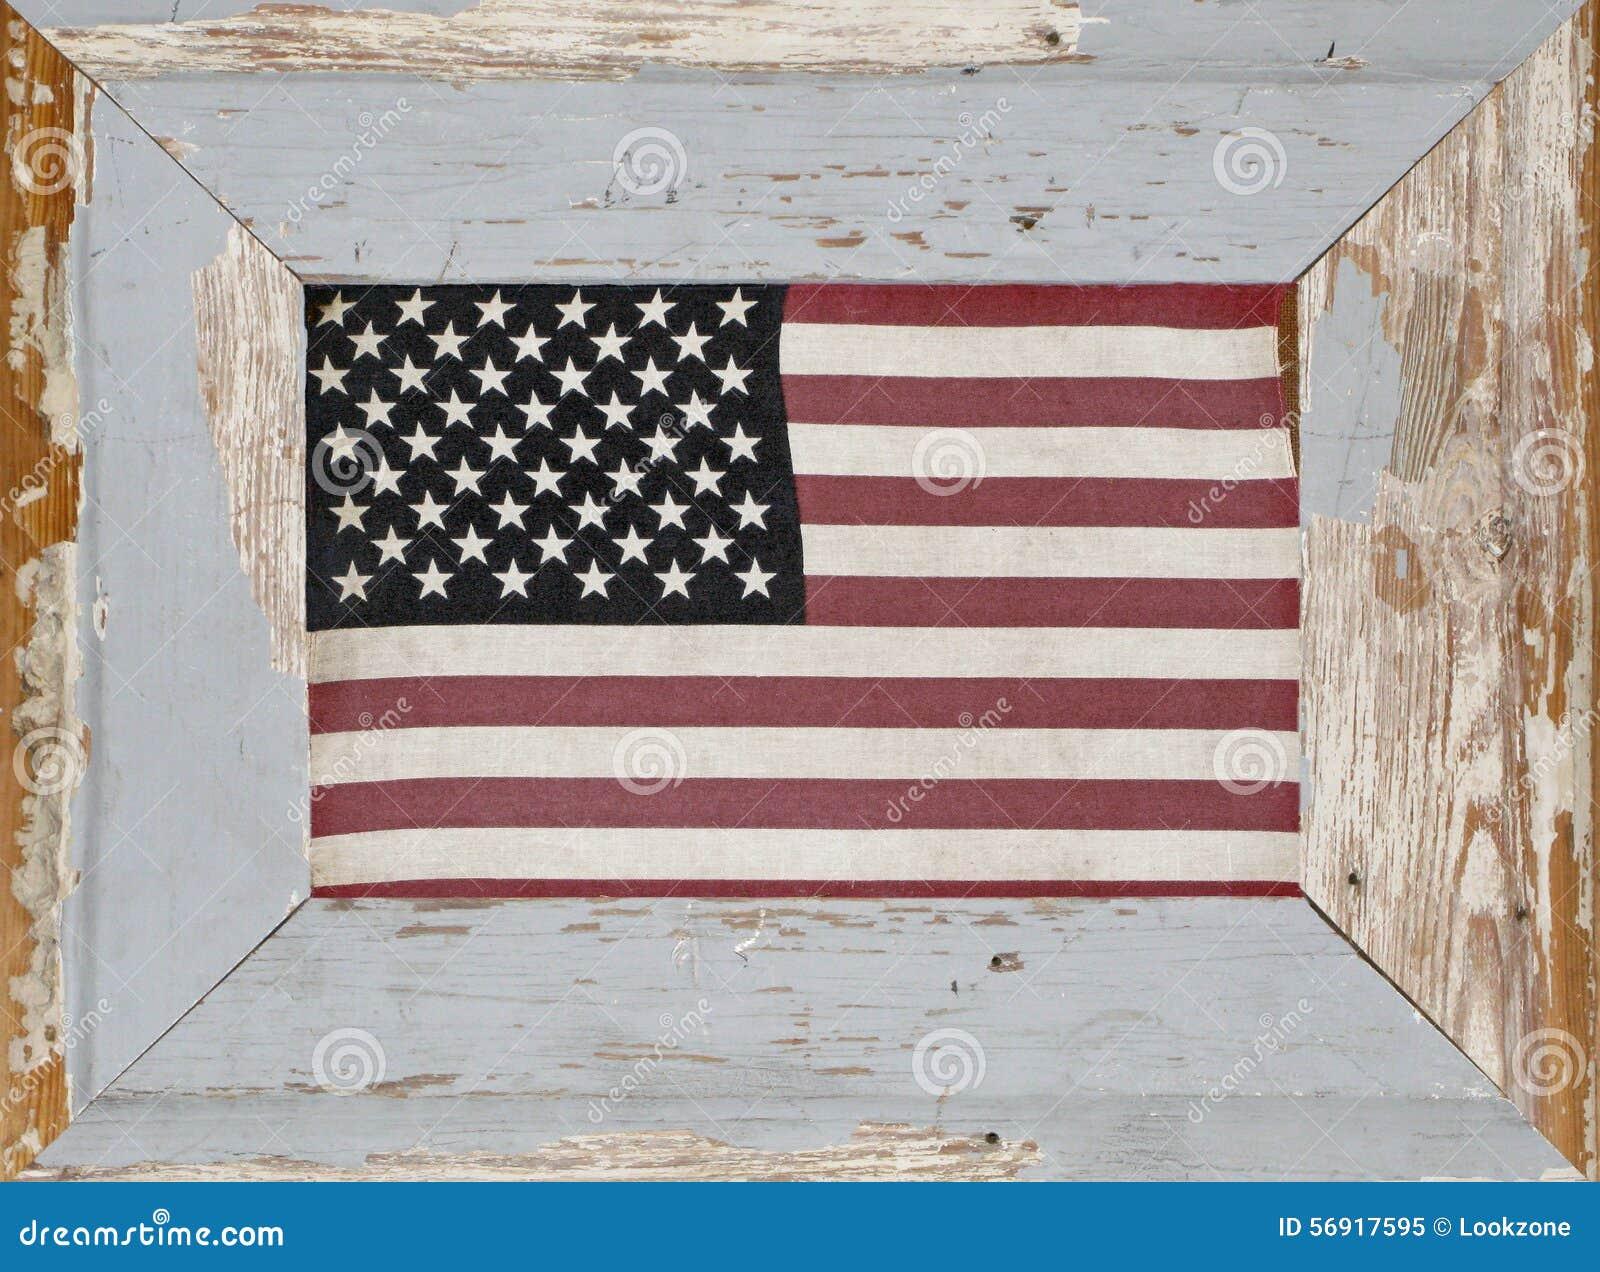 A Rustic Framed Vintage American Flag Stock Image Image